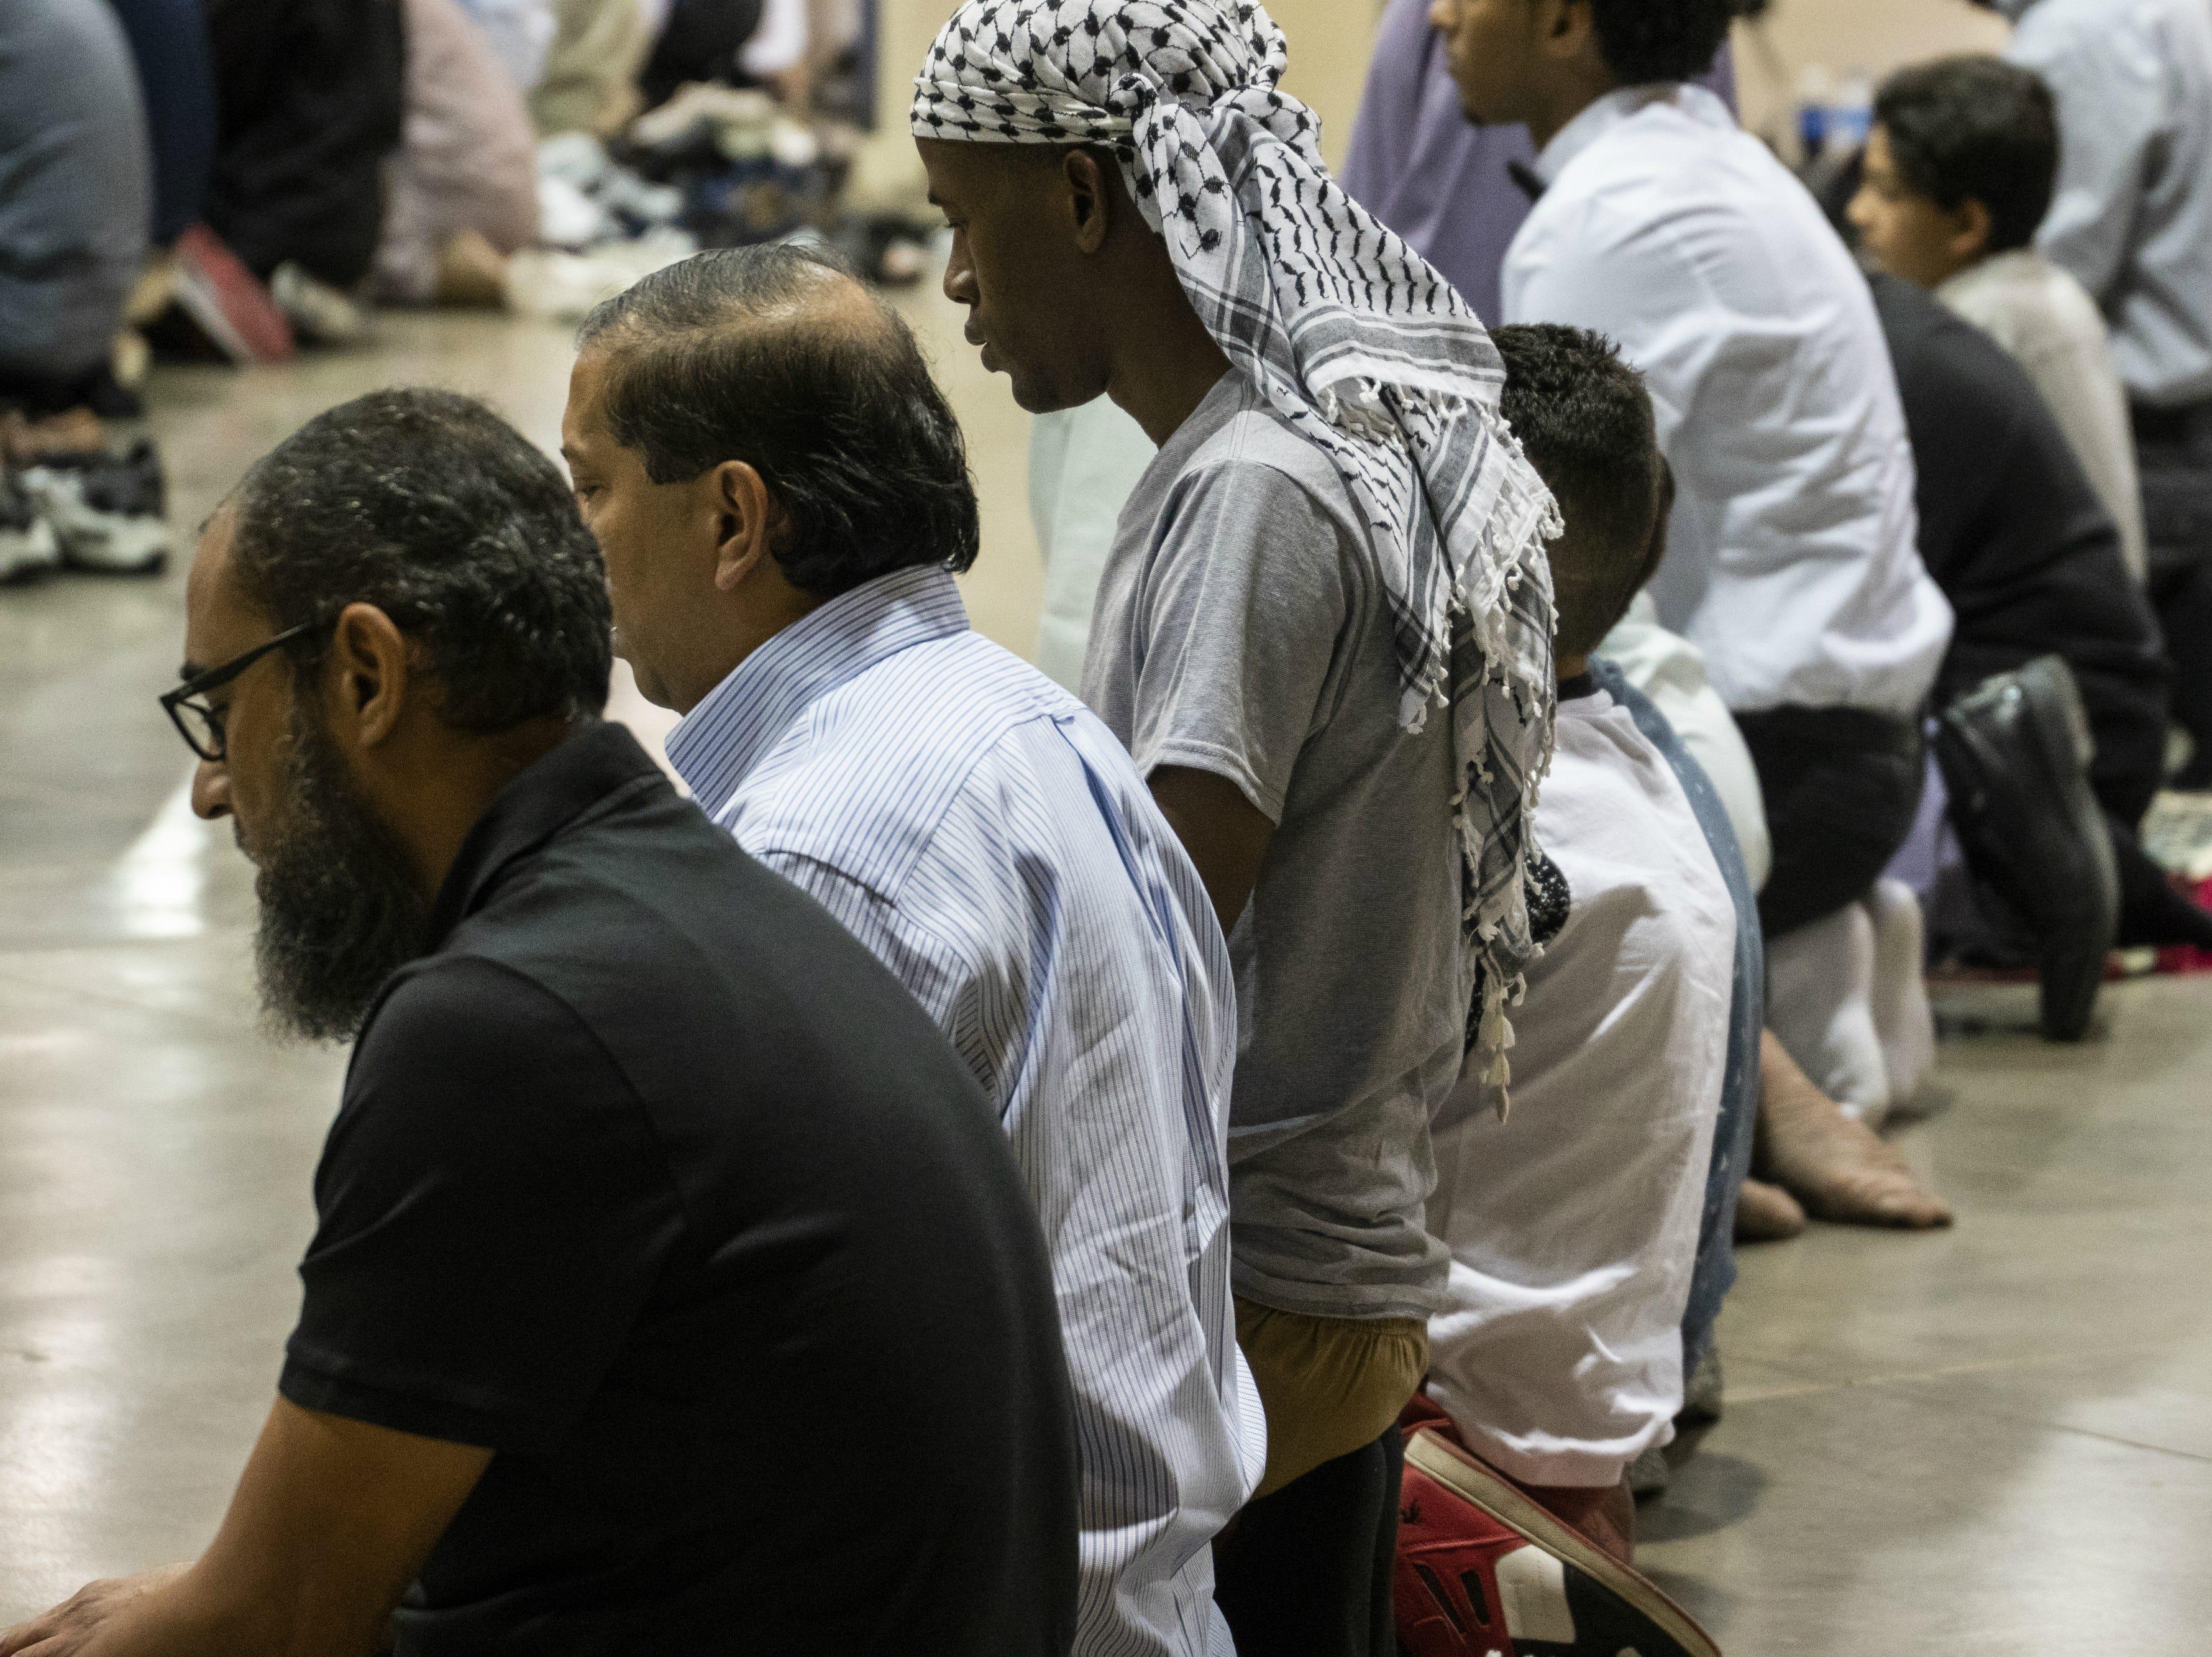 Men pray at an Eid celebration on Aug. 21, 2018, in Phoenix.